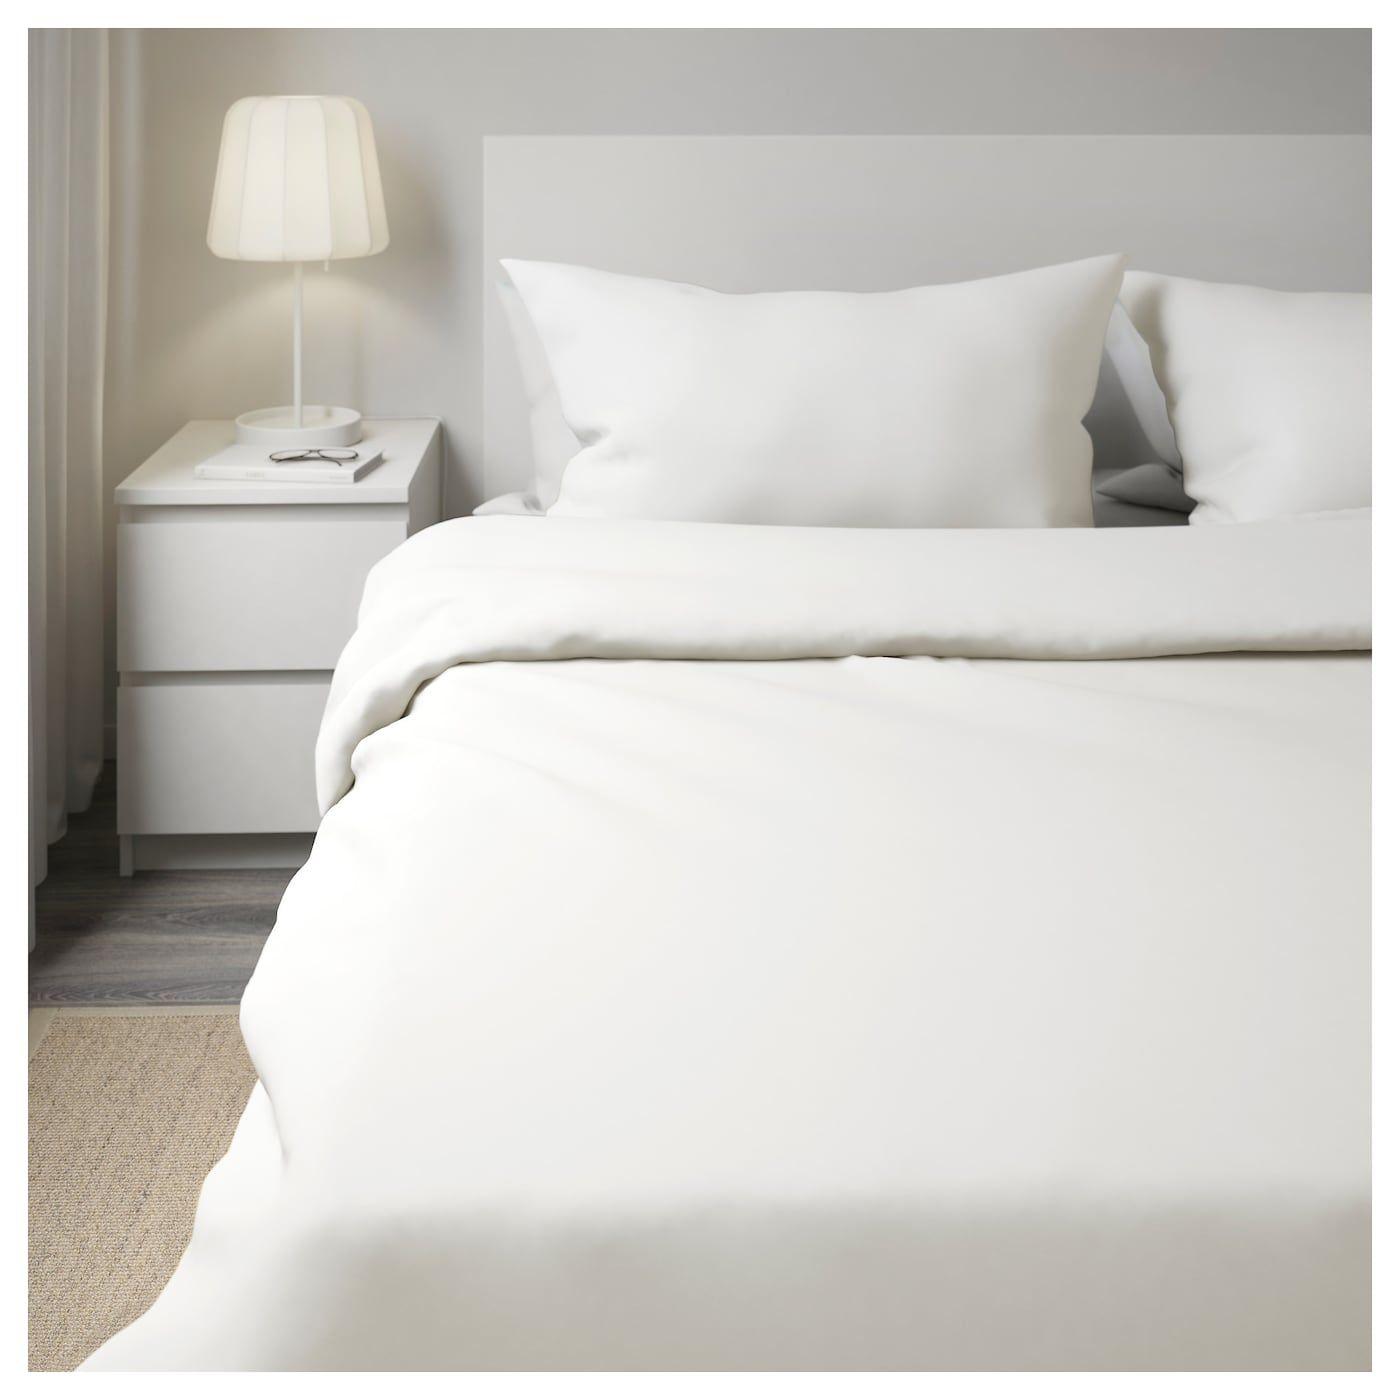 Ikea Fargmara Bettwascheset 3 Teilig Ikea Bett Ikea Bett